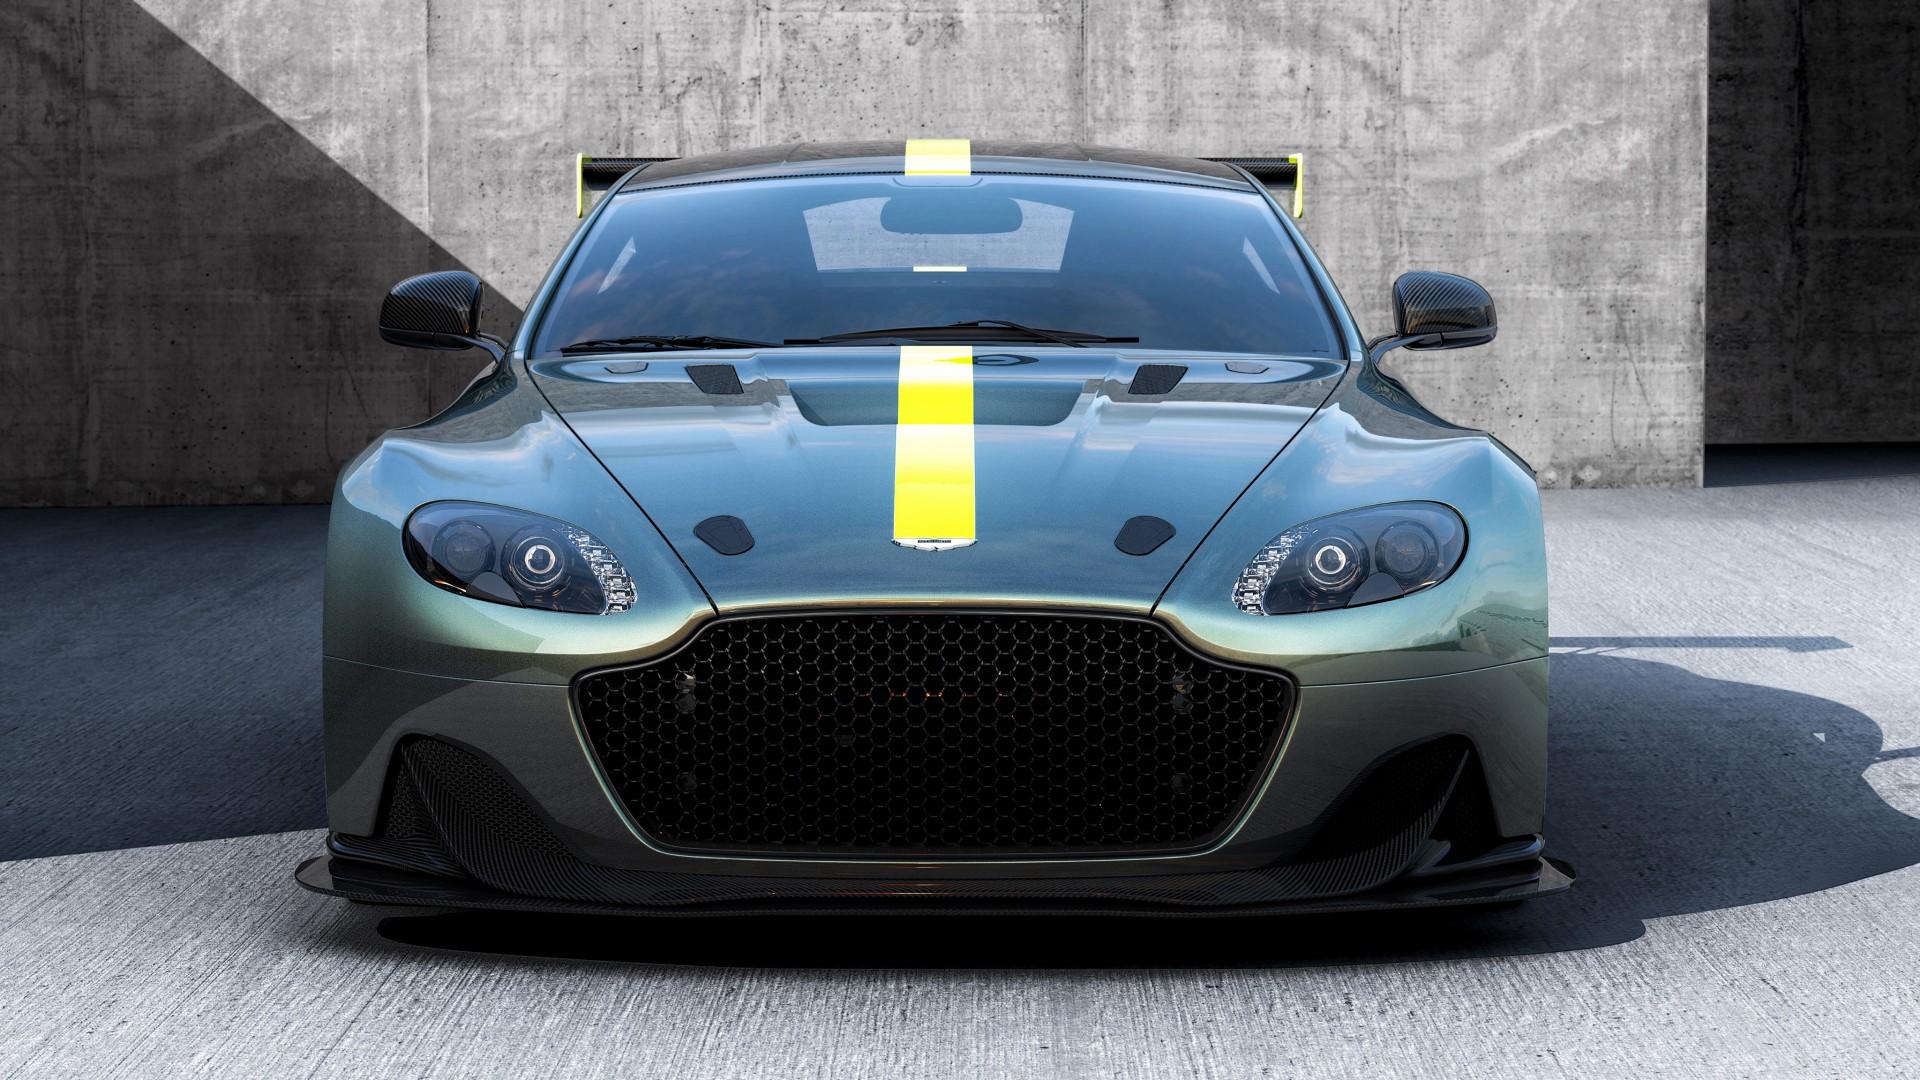 2018 Aston Martin Vantage AMR Pro Wallpaper | HD Car ...